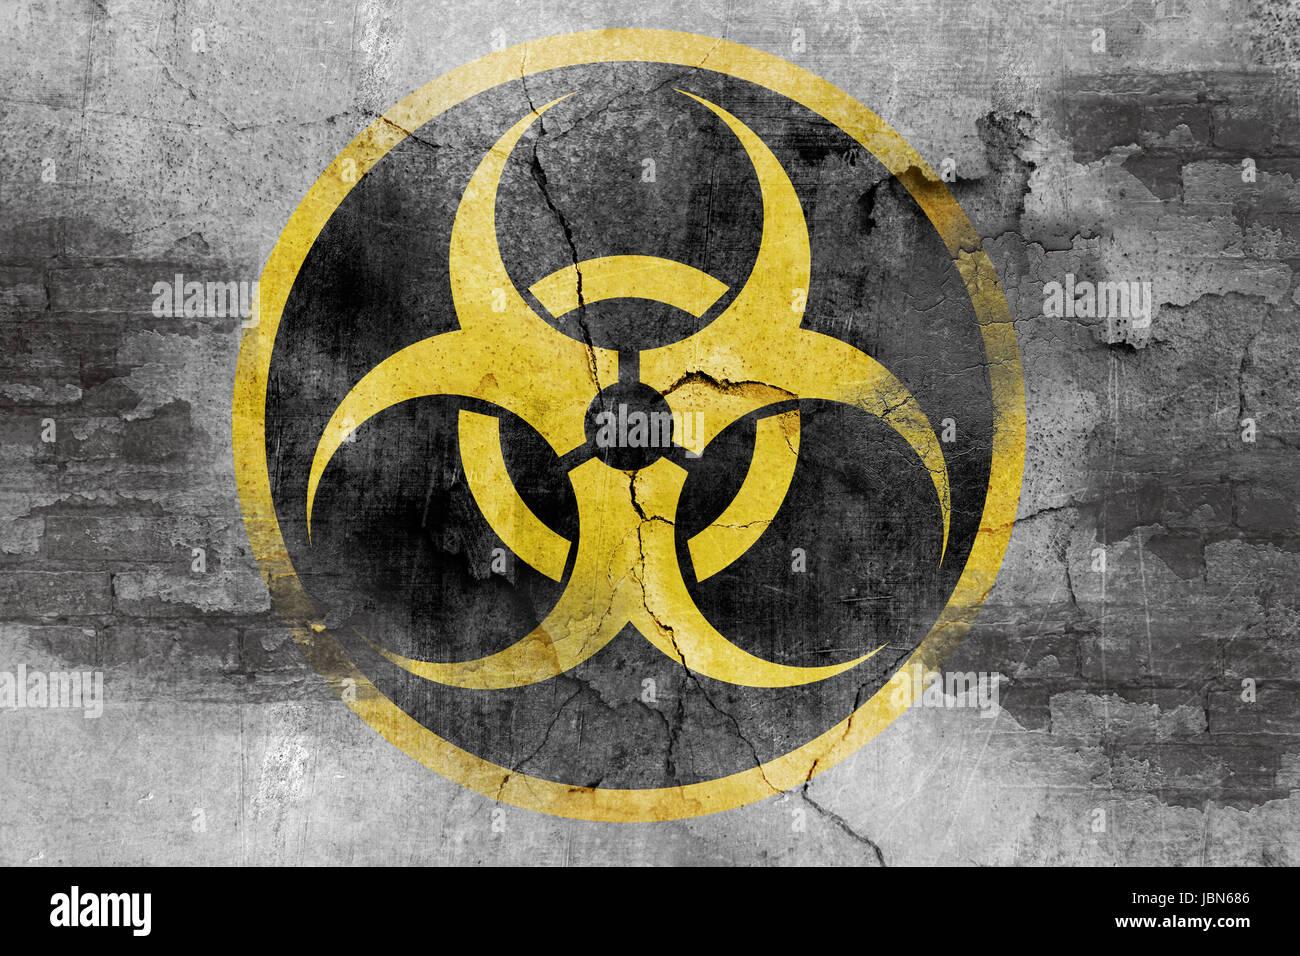 Biohazard symbol on concrete wall stock photo royalty free image biohazard symbol on concrete wall buycottarizona